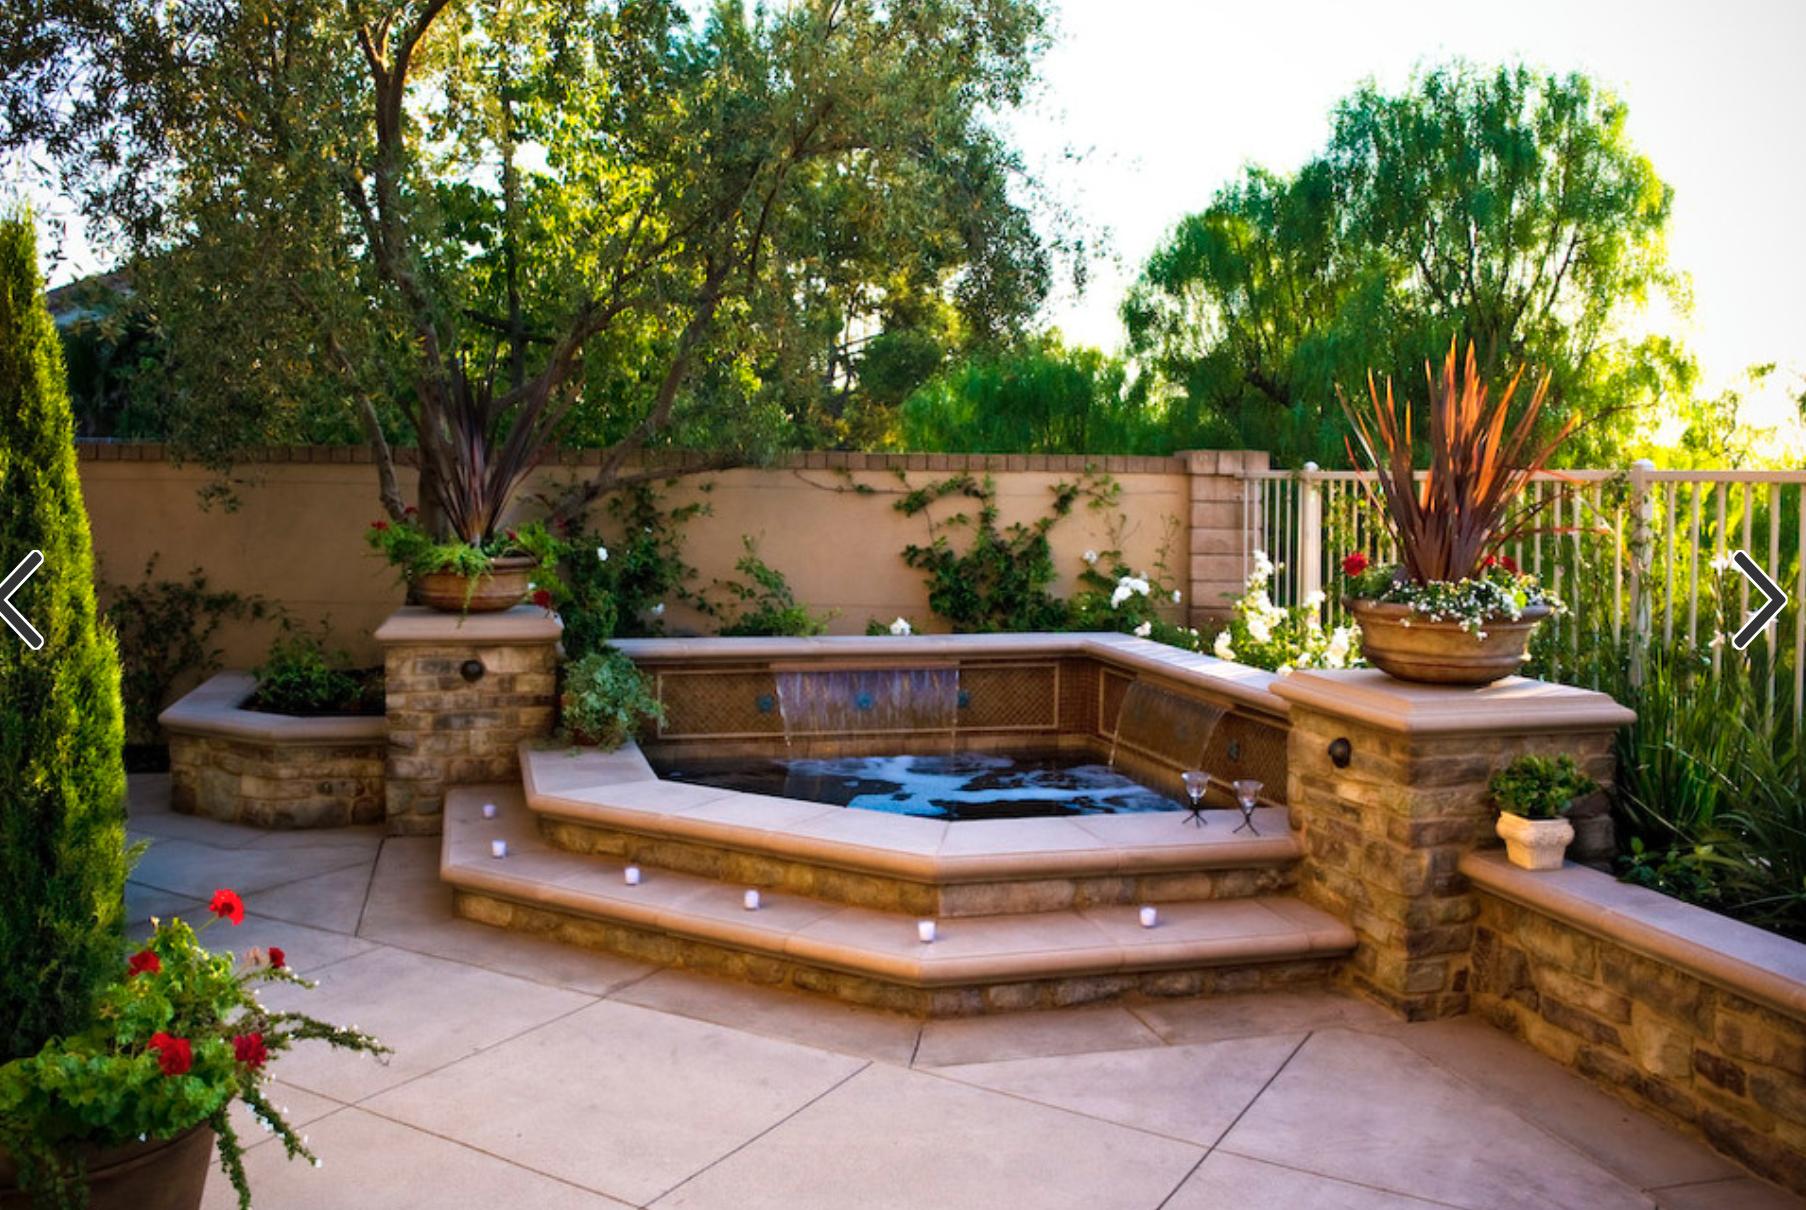 Backyard Spool Hot Tub Pool For Downward Slope In Backyard